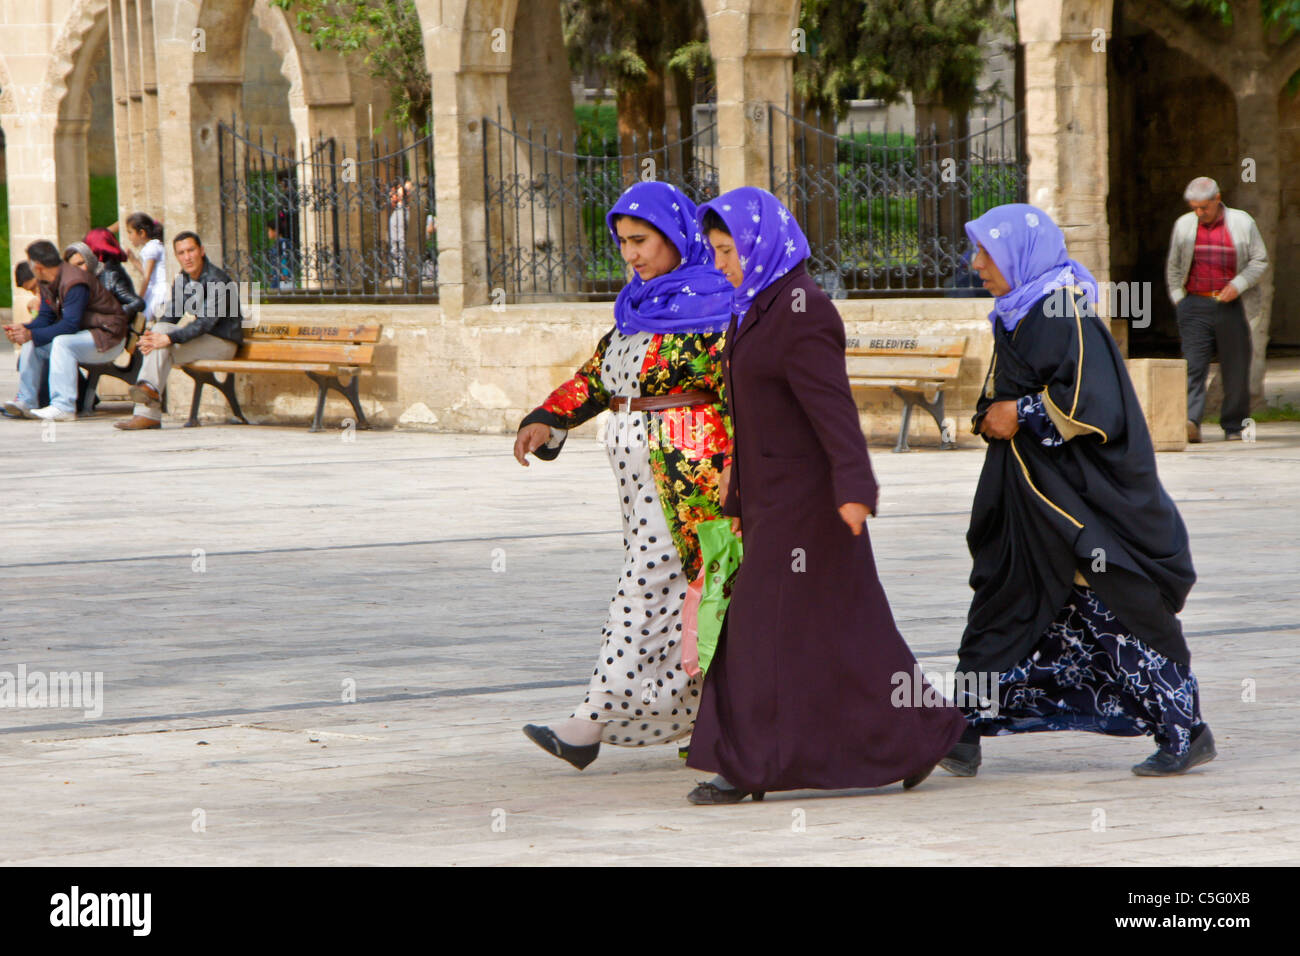 Muslim women in traditional dress in Sanliurfa (Urfa), Turkey - Stock Image